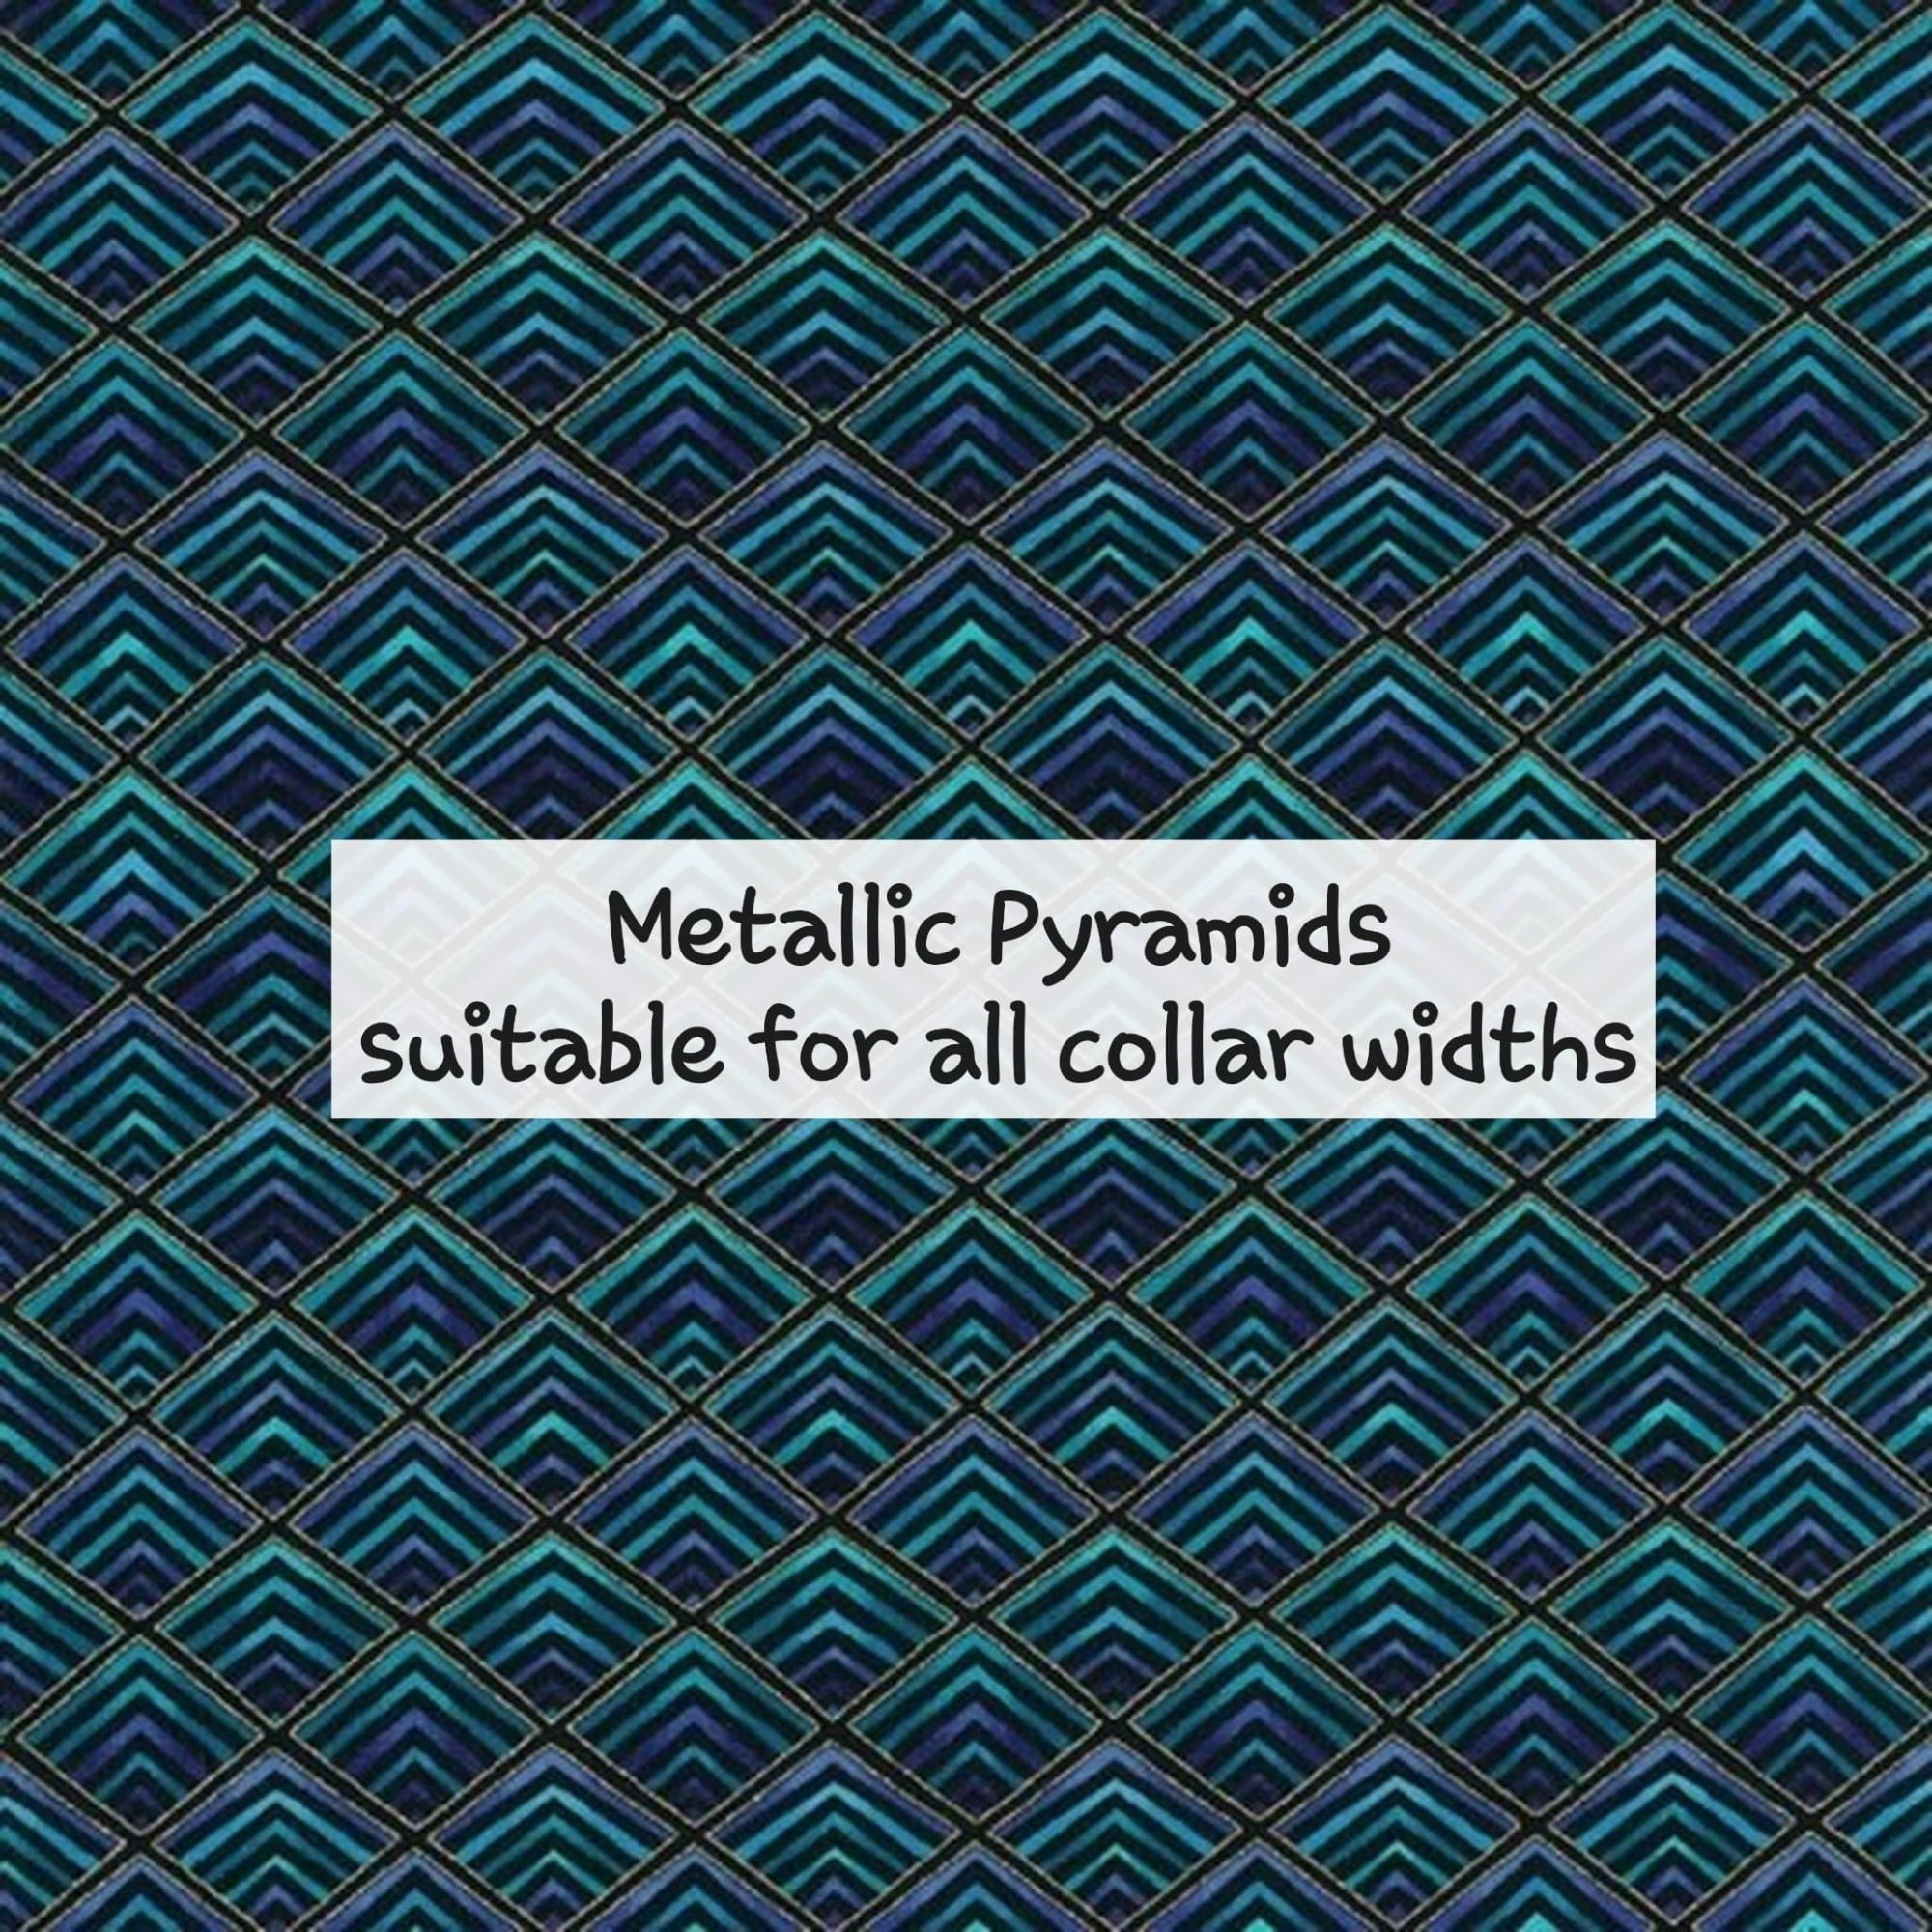 Metallic Pyramids